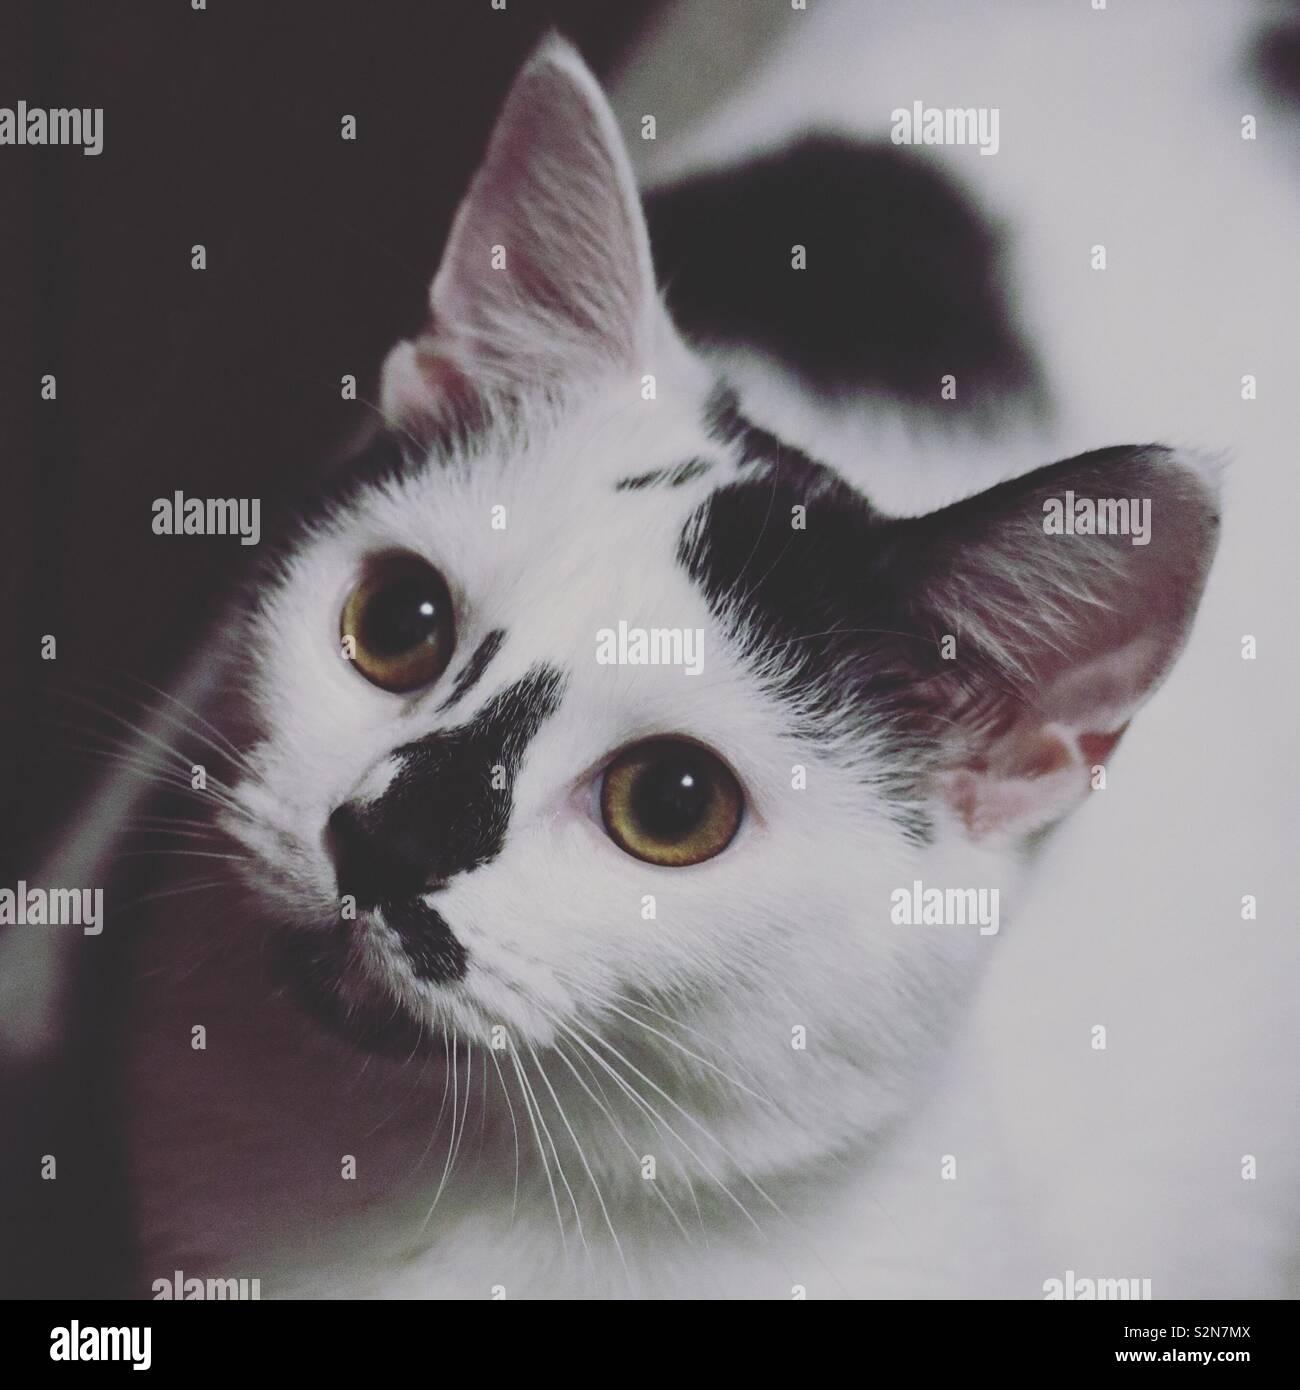 Black and white kitten - Stock Image